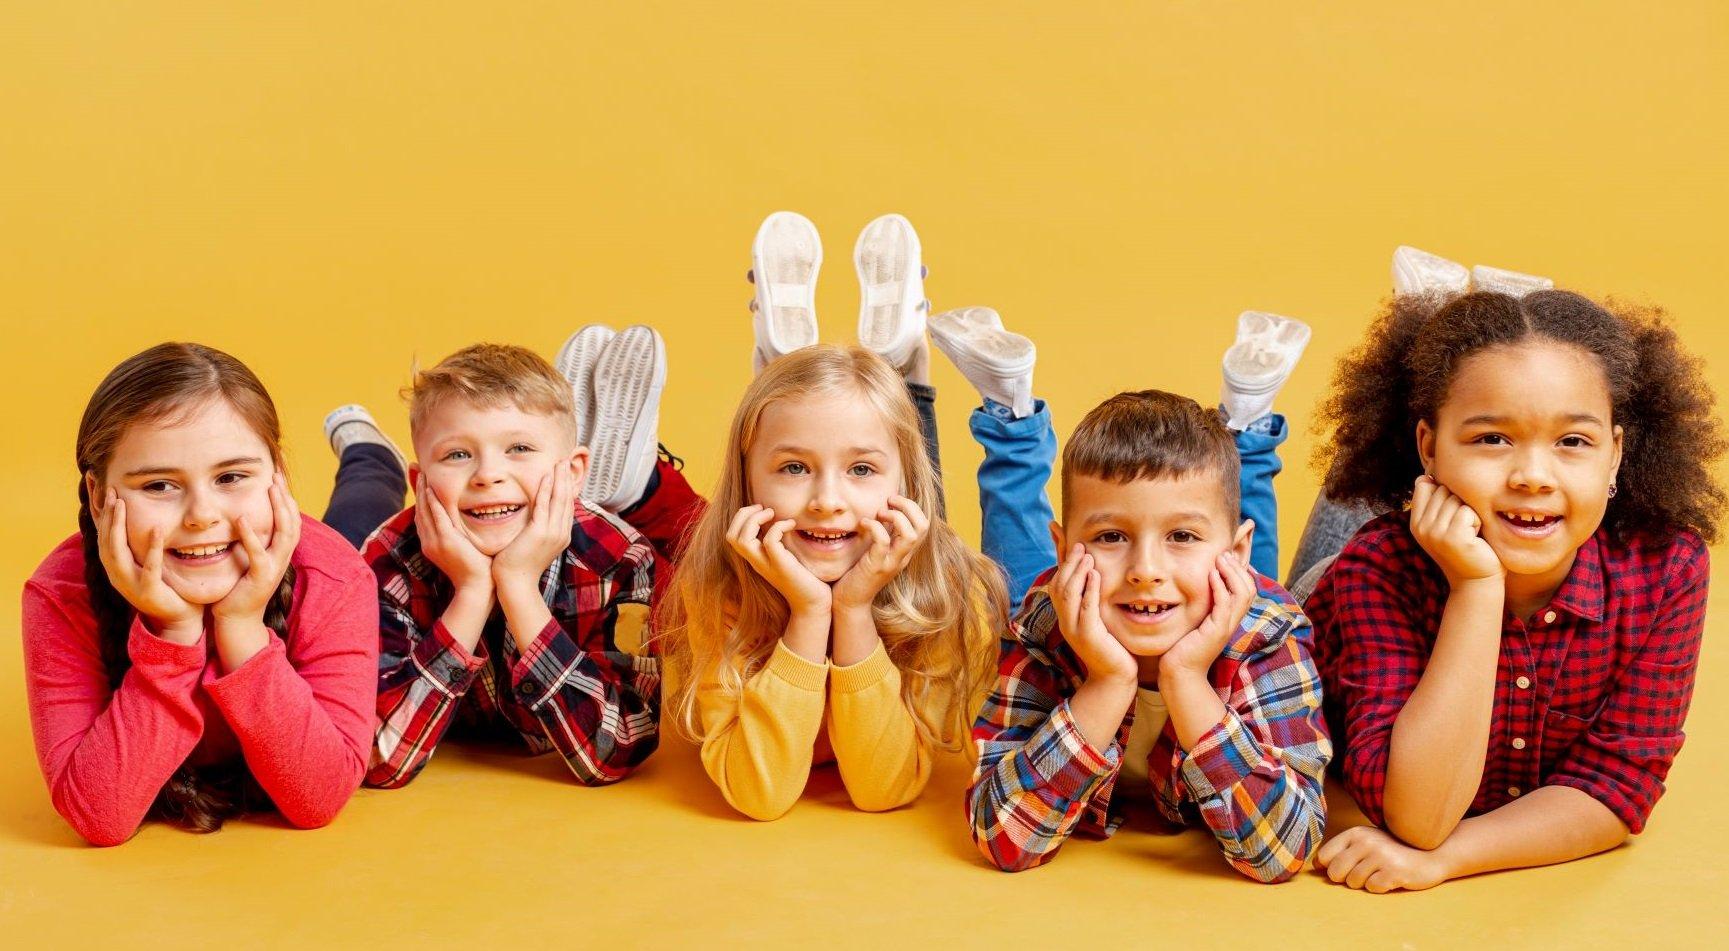 Chino para niños: aprender jugando